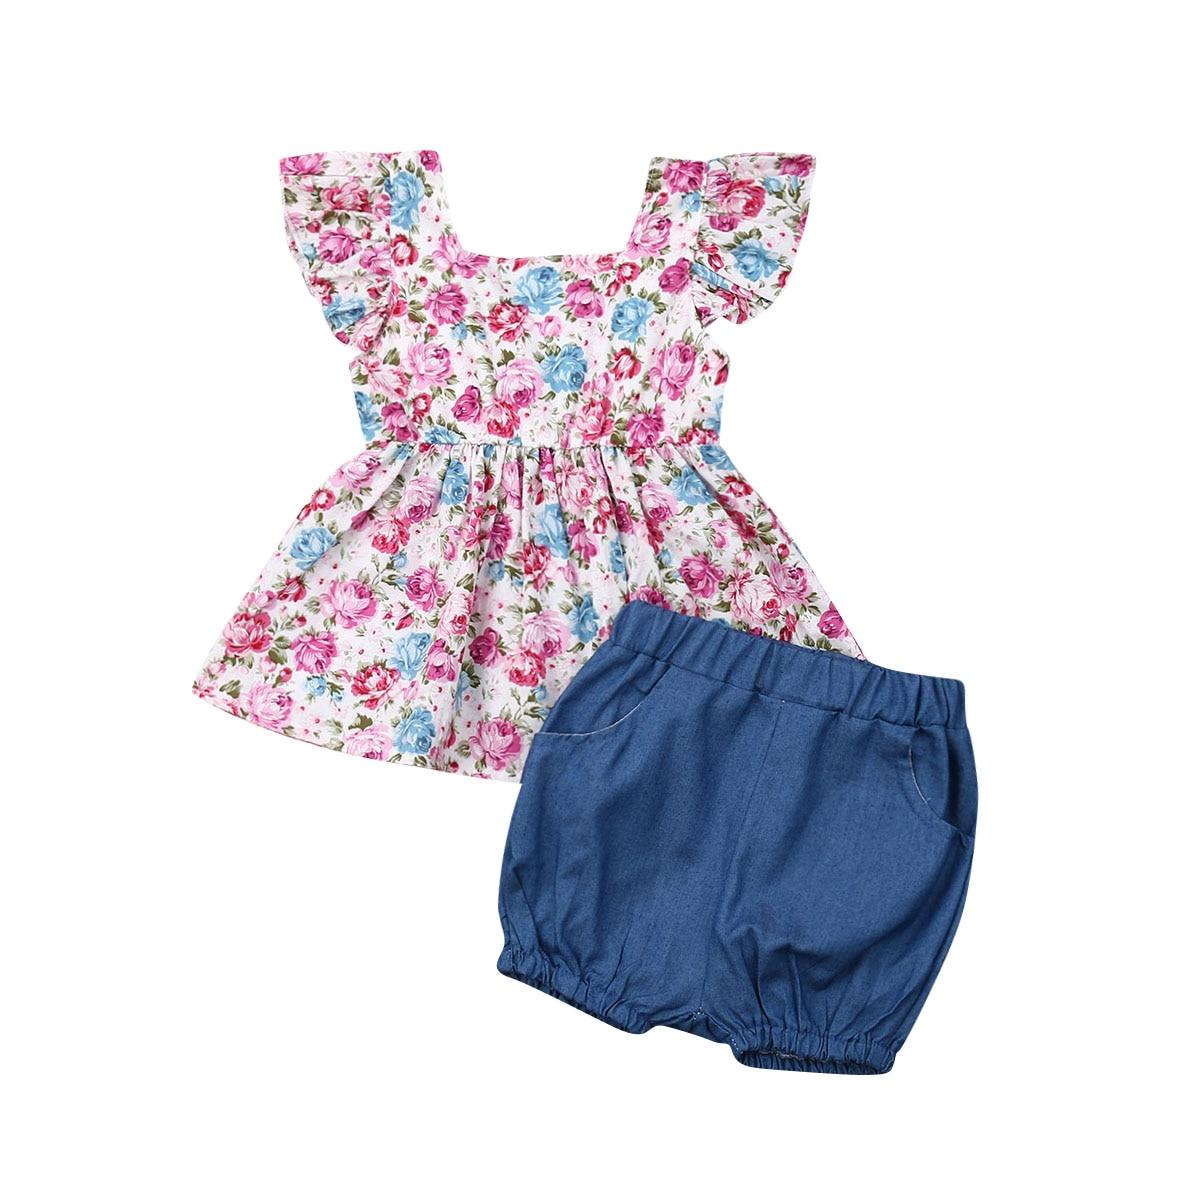 Toddler Kids Baby Girl Tops T-Shirt Dress Short Pants Outfits Clothes Summer Set